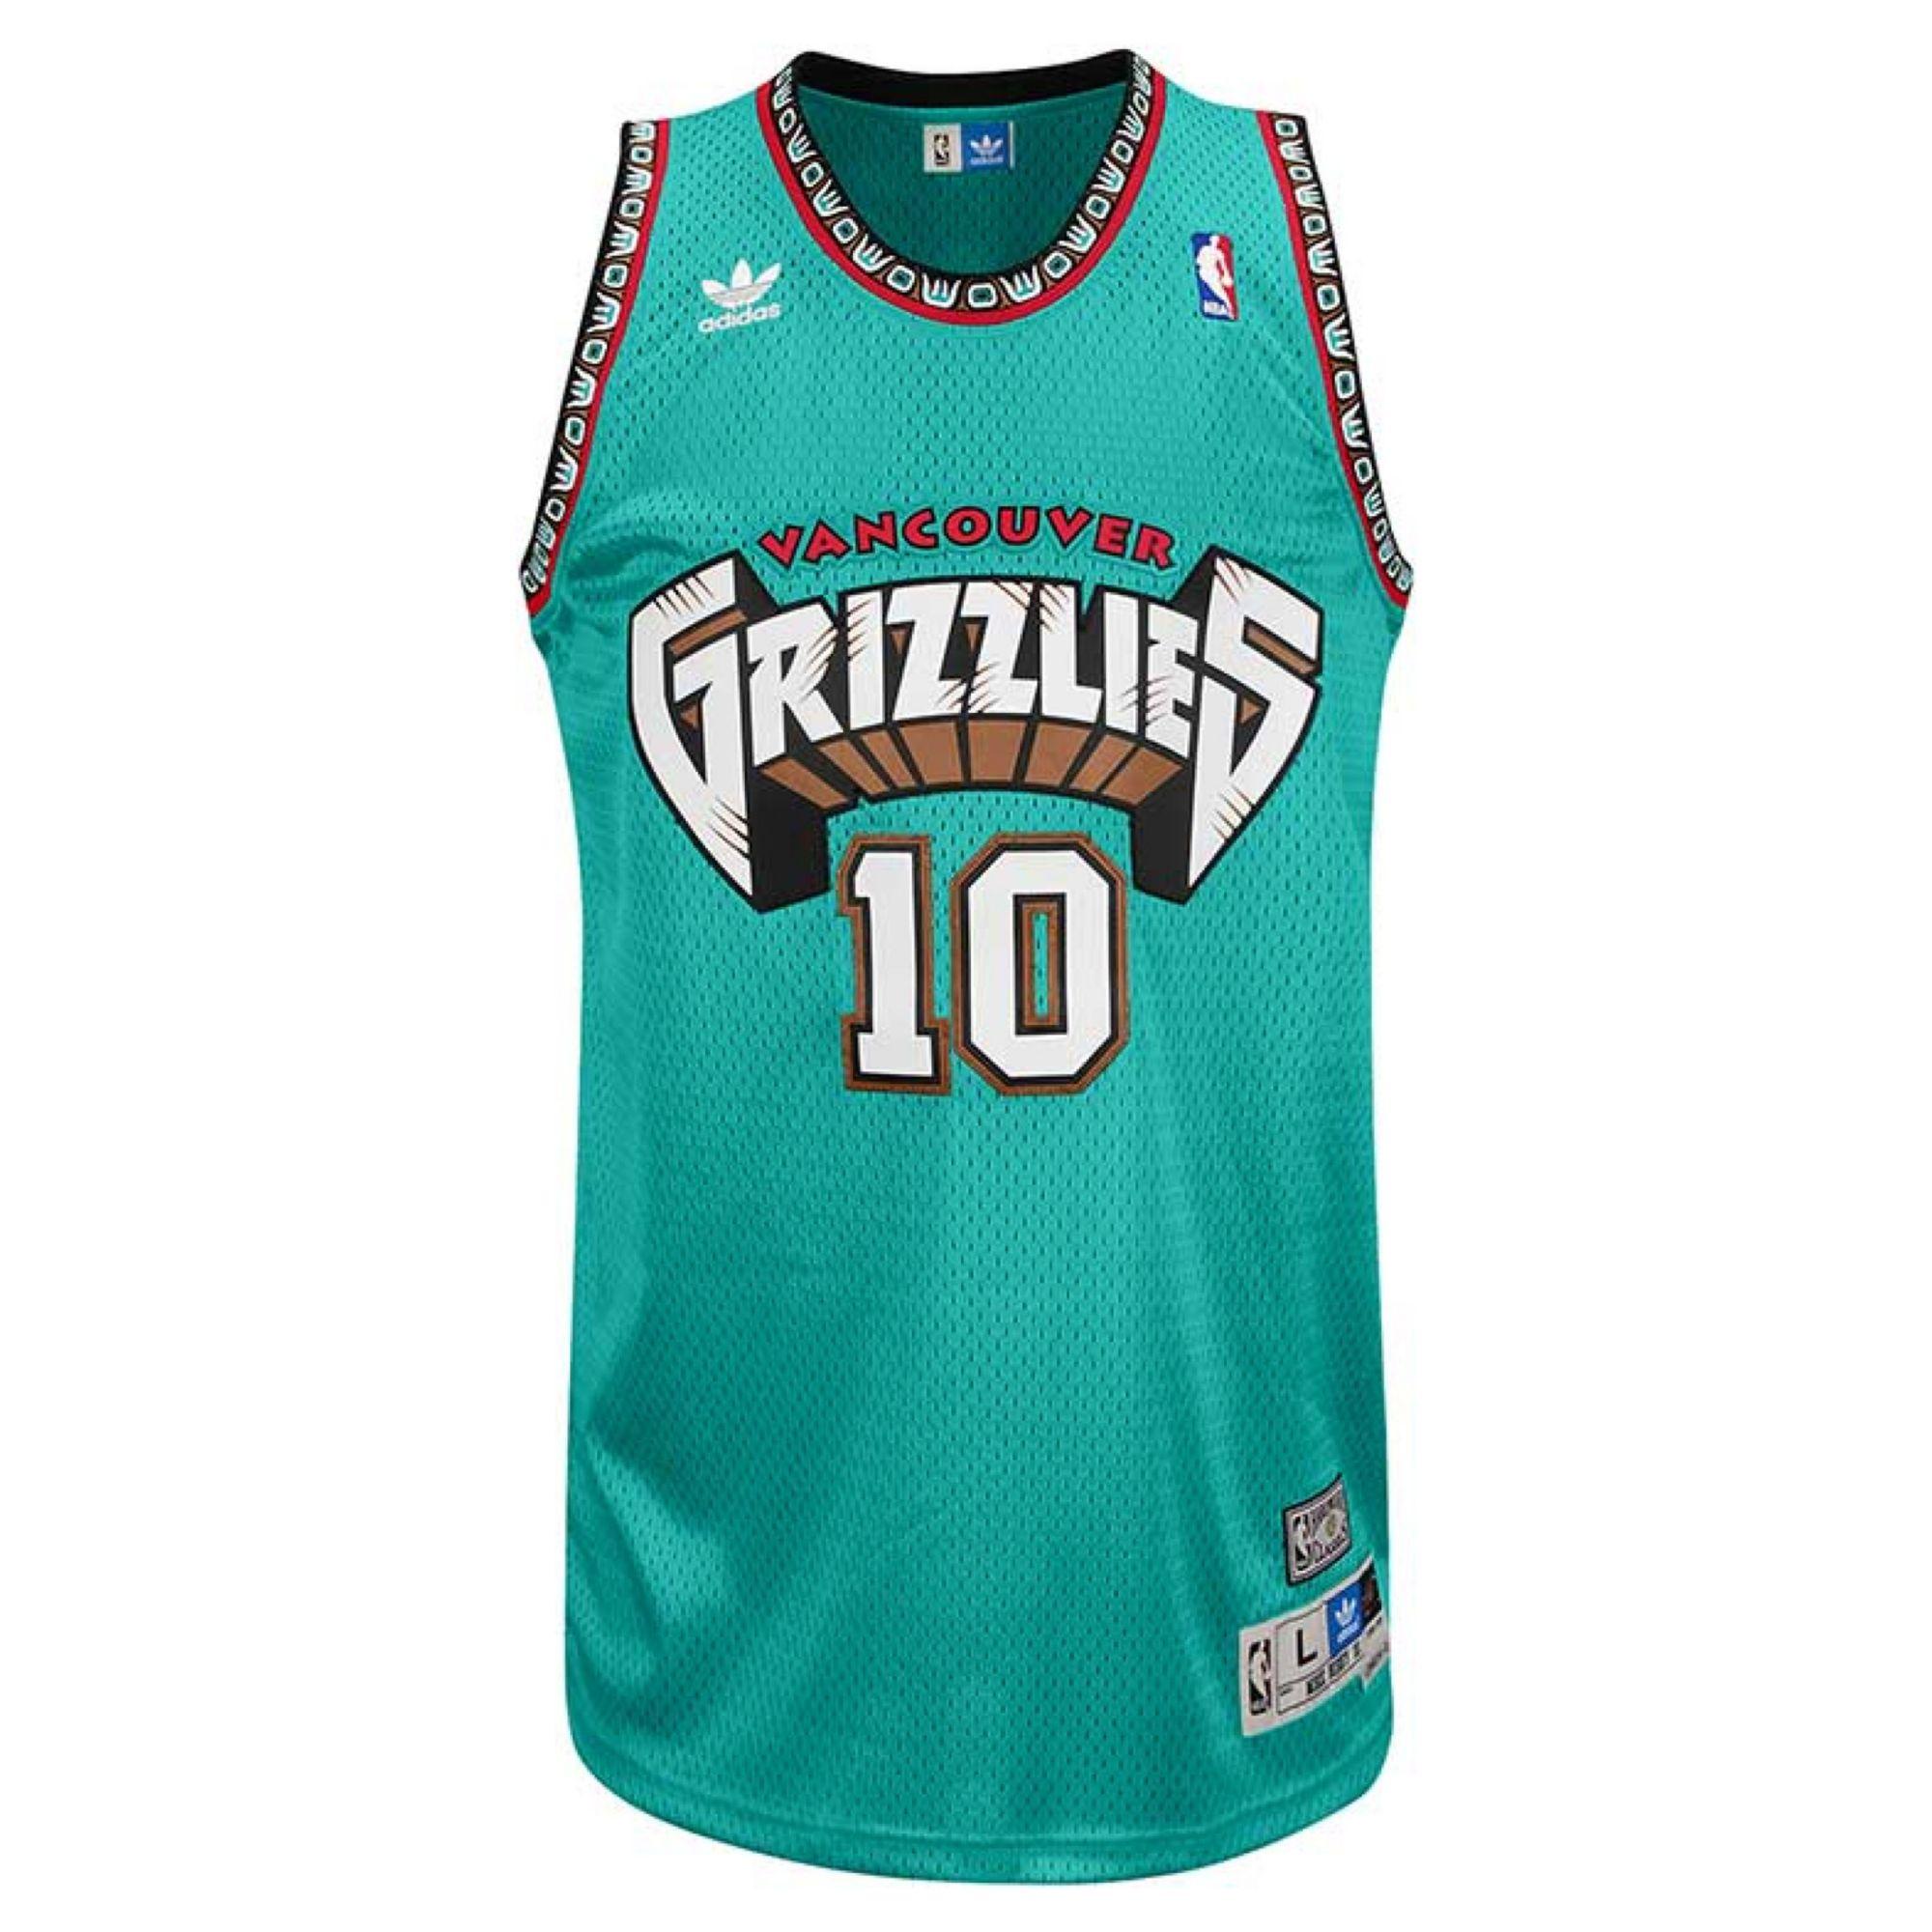 6aa4477b242 adidas Mens Mike Bibby Vancouver Grizzlies Retired Player Swingman ...